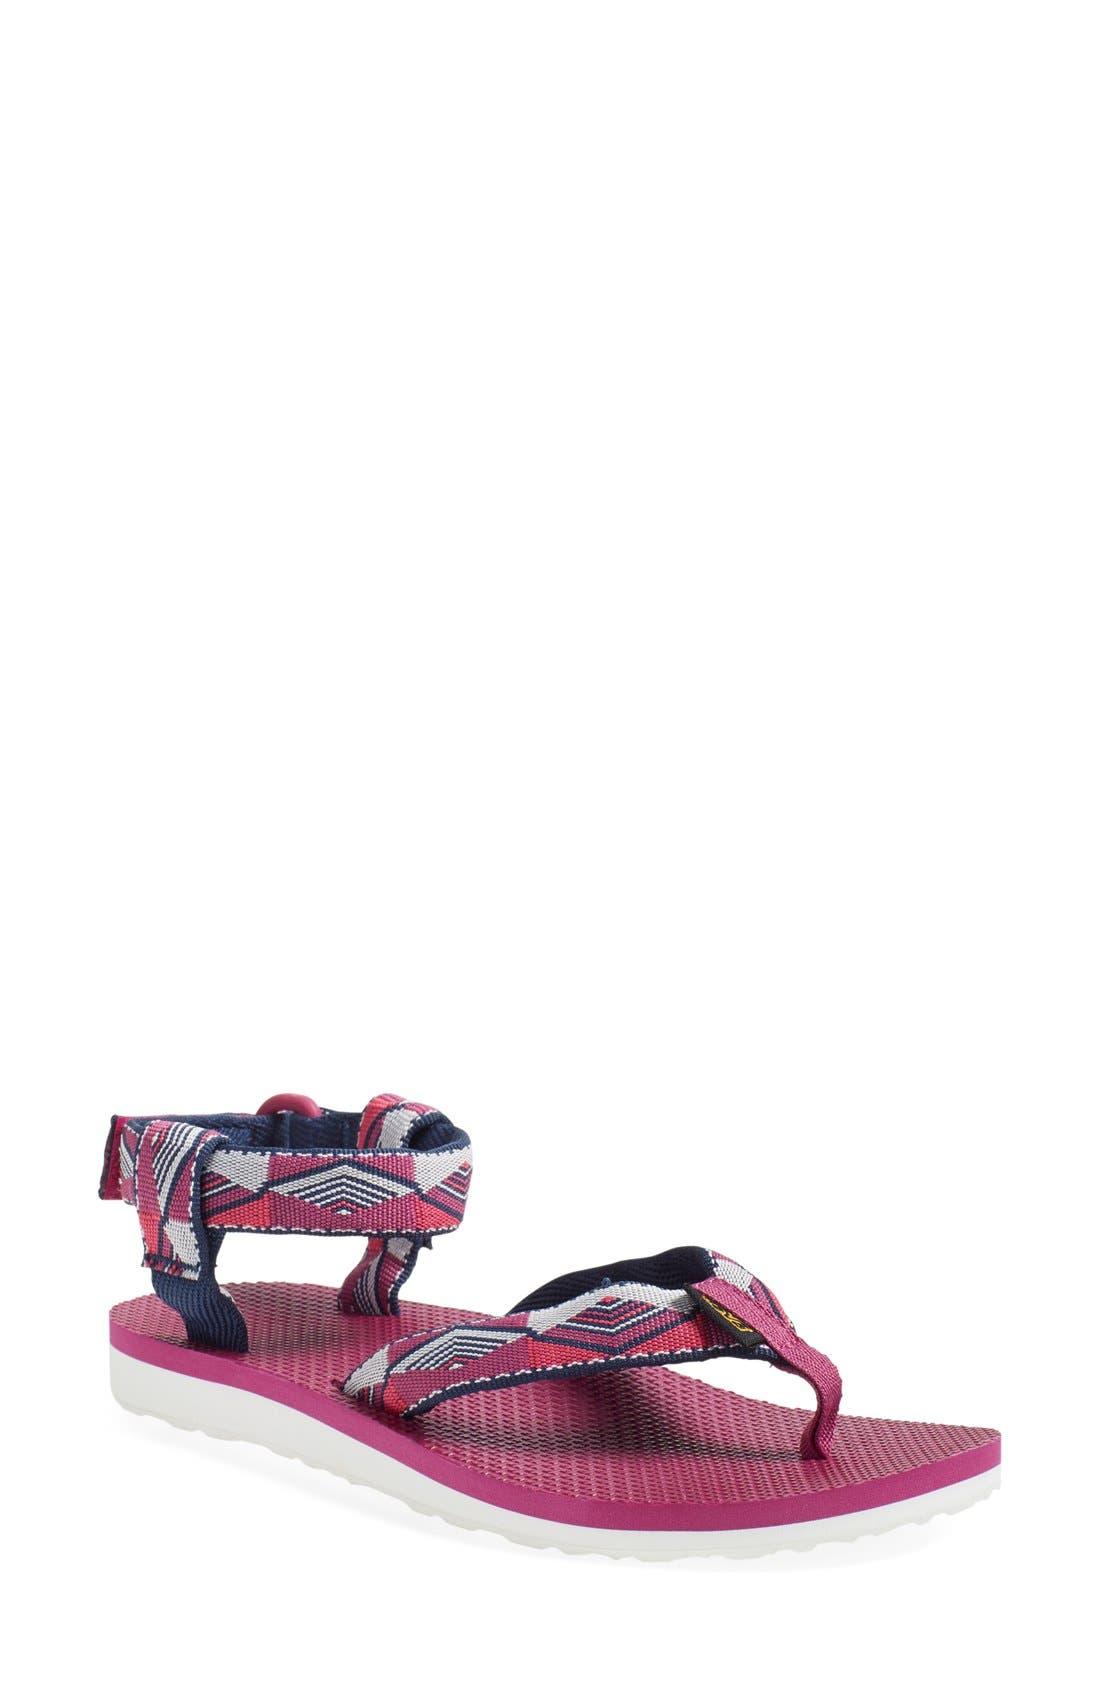 Original Sport Sandal,                         Main,                         color, Pyramid Raspberry